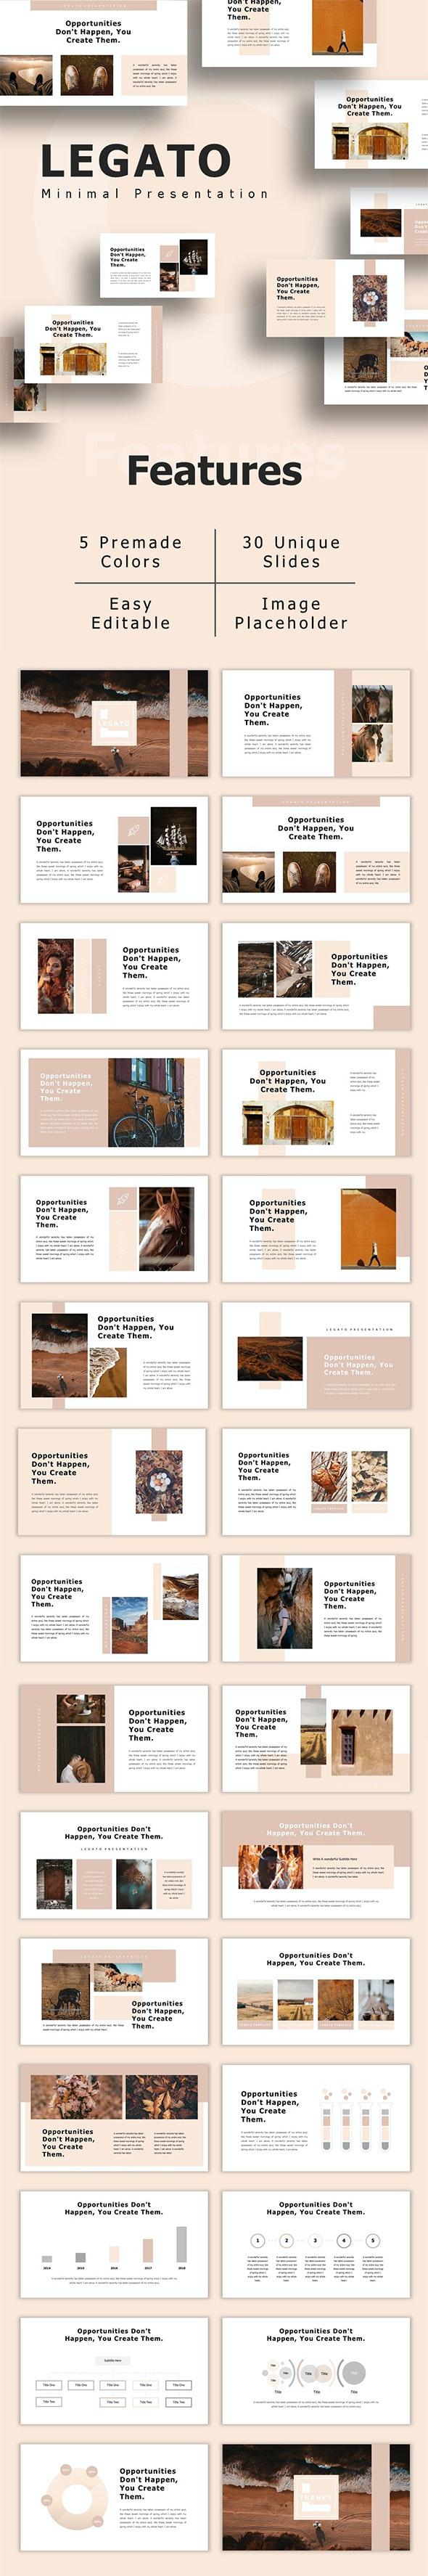 Legato - Creative Presentation PowerPoint Template - Creative PowerPoint Templates